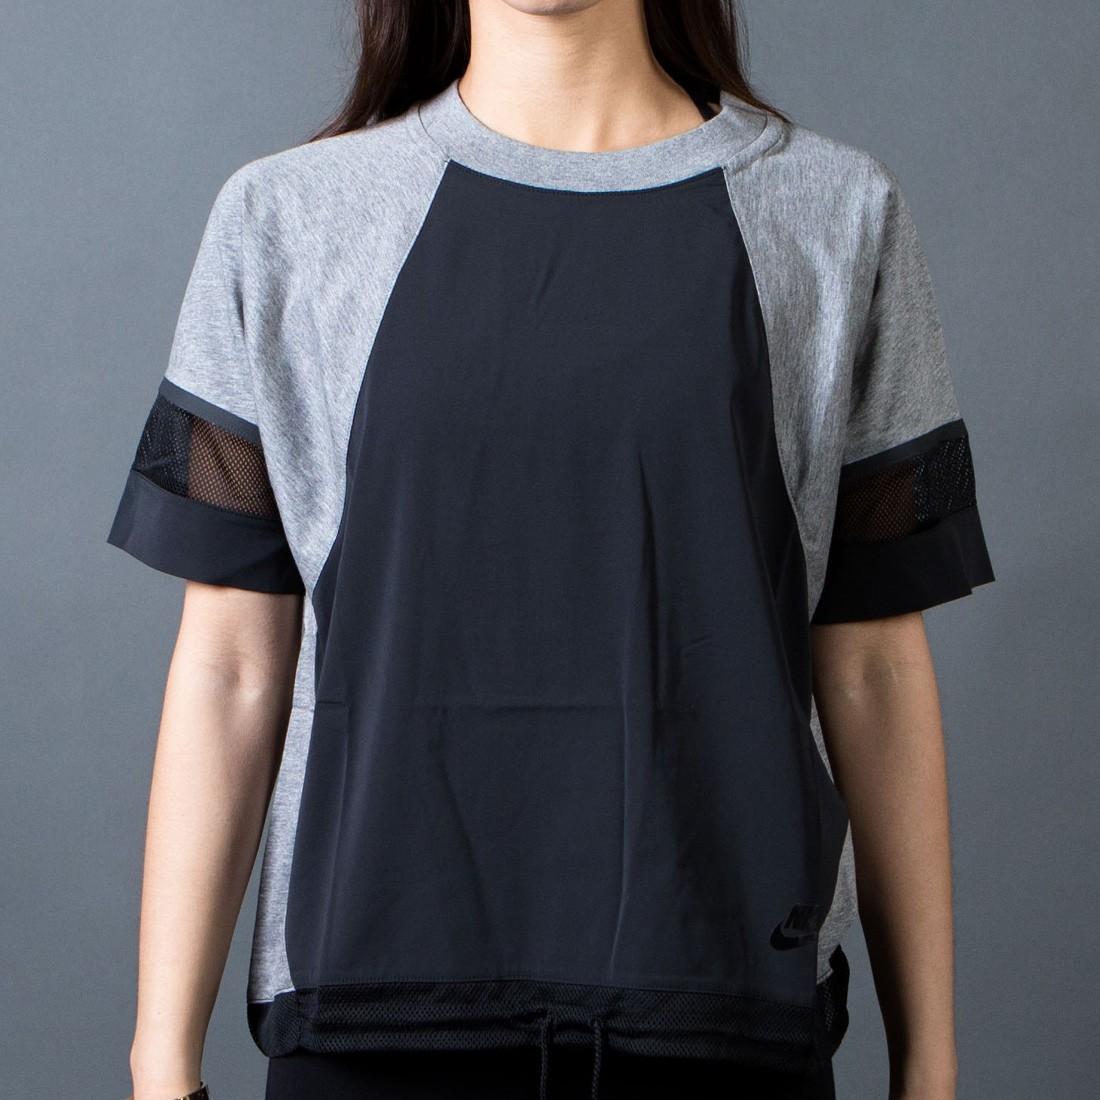 Nike Women Bonded Tee (black / carbon heather / black)